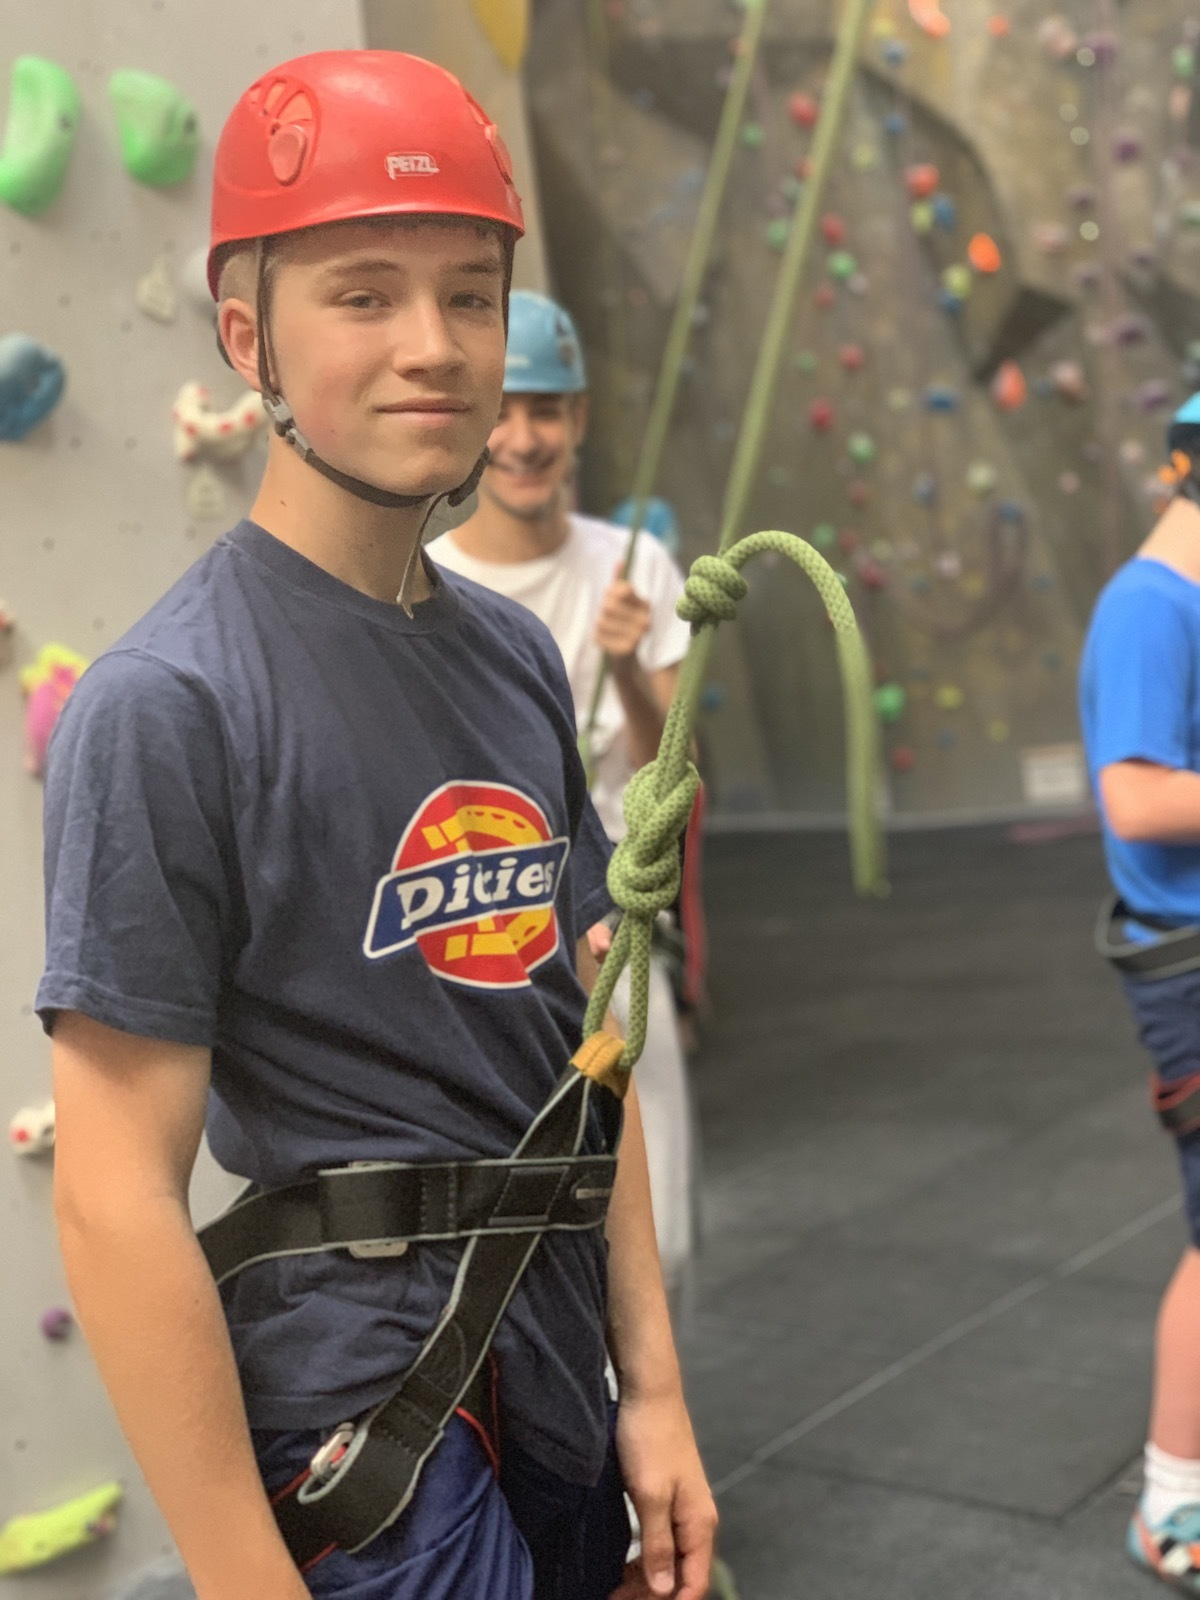 Smma st mary magdalene academy islington london summer activities week 2019 climbing course